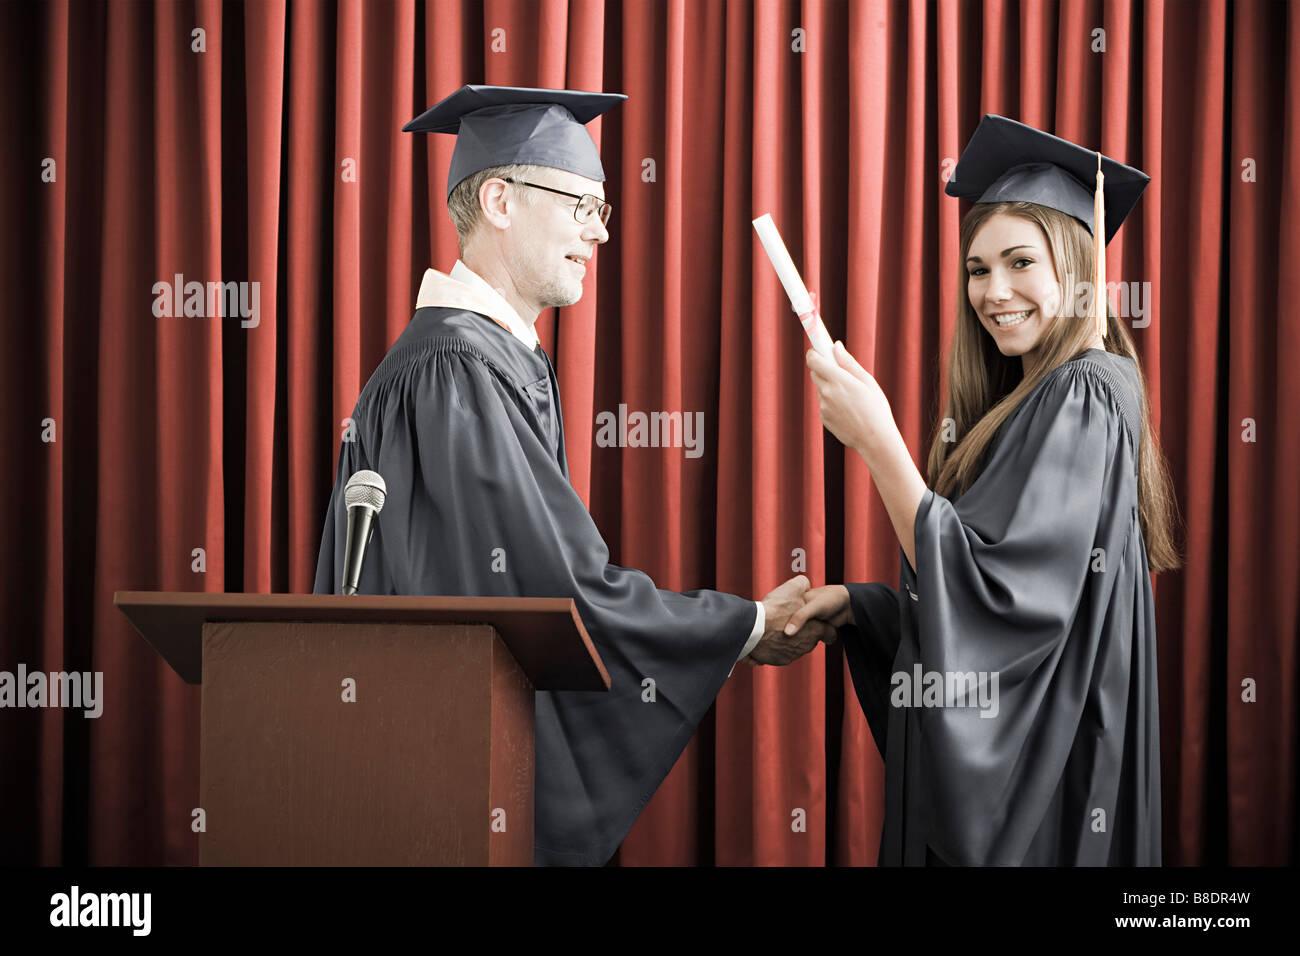 Girl graduating - Stock Image